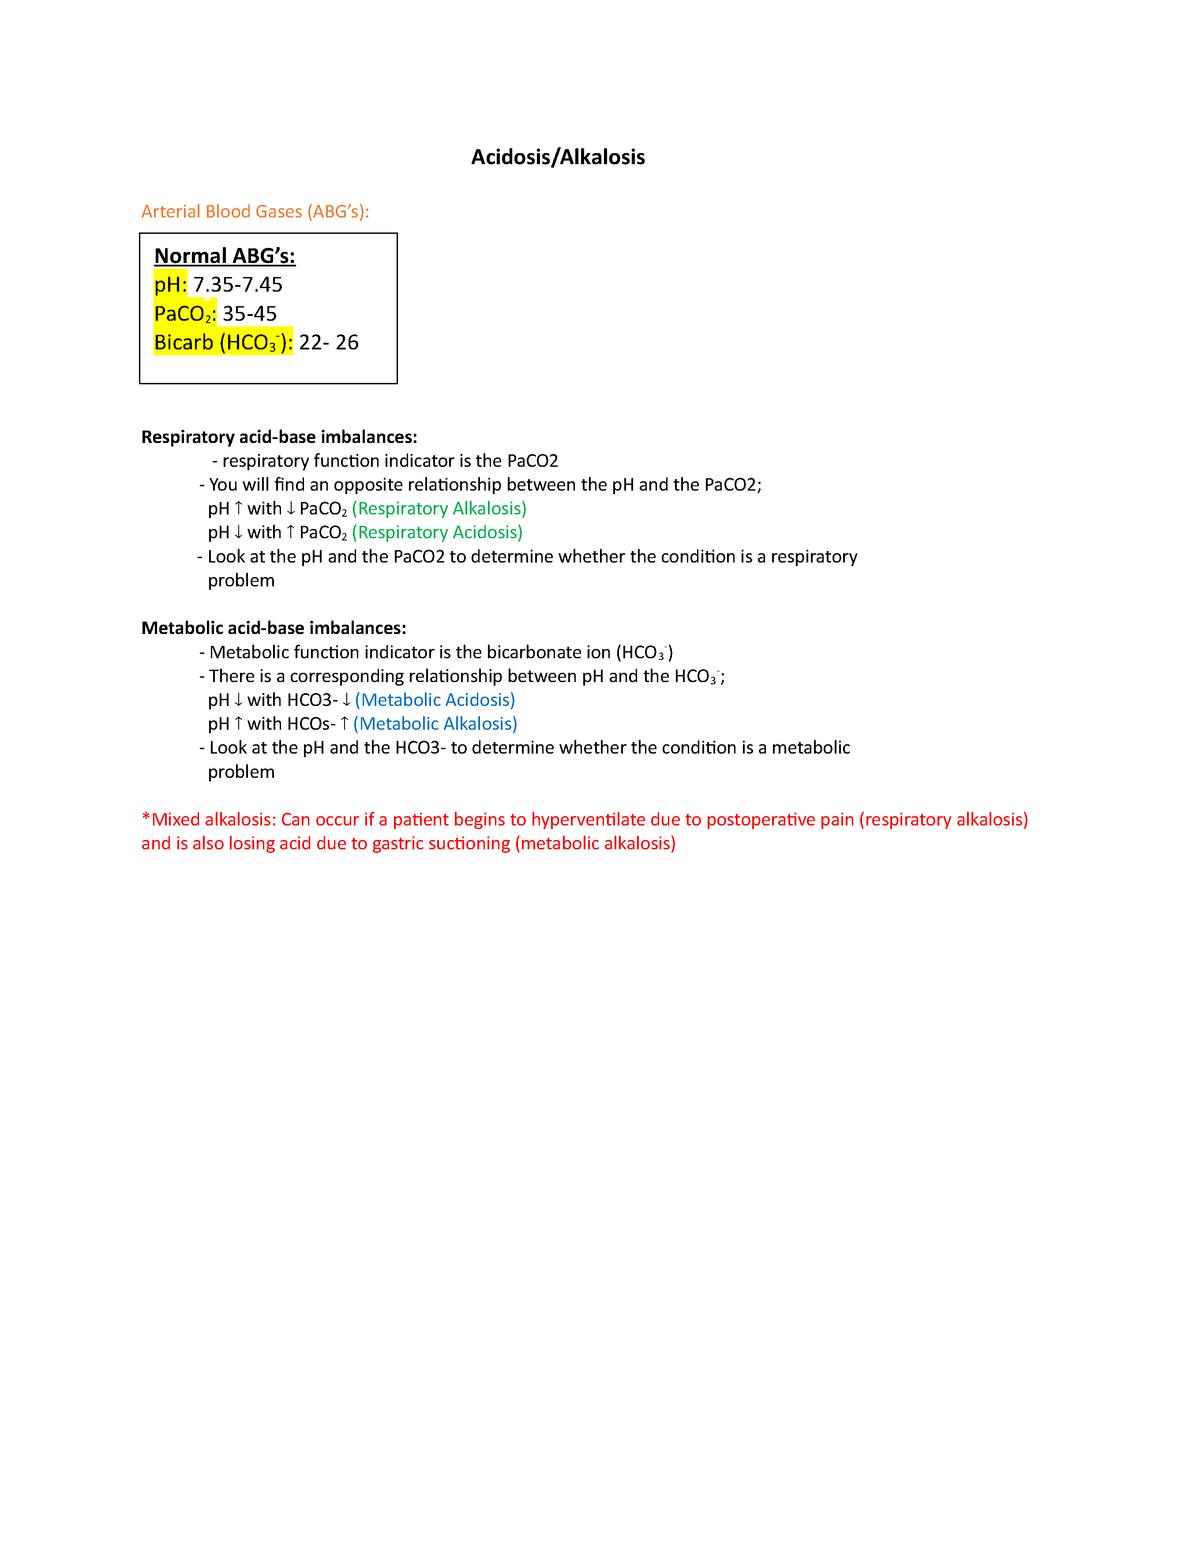 Acidosis Alkalosis Lecture Notes 5 Nurs 4521 Hcc Studocu